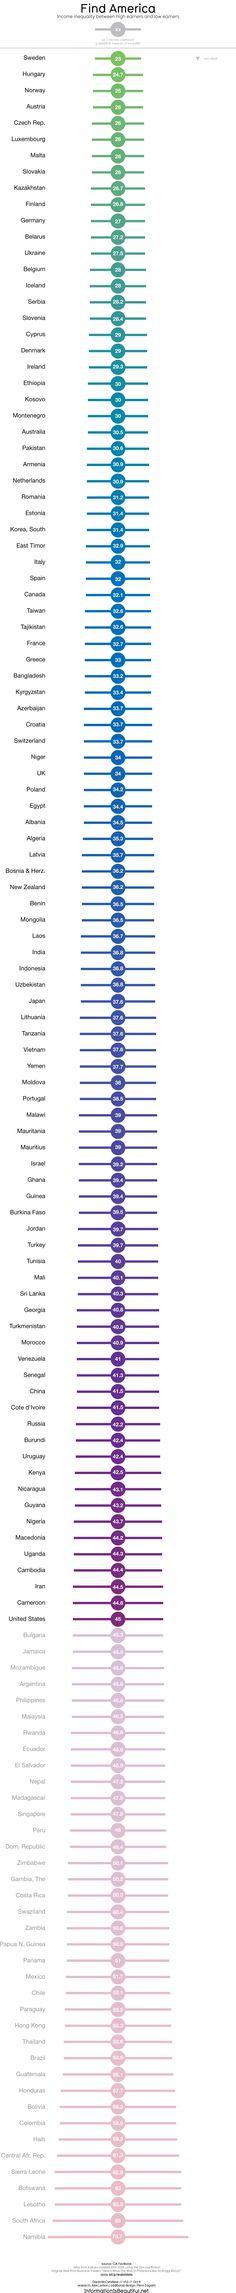 David McCandless #income #inequality